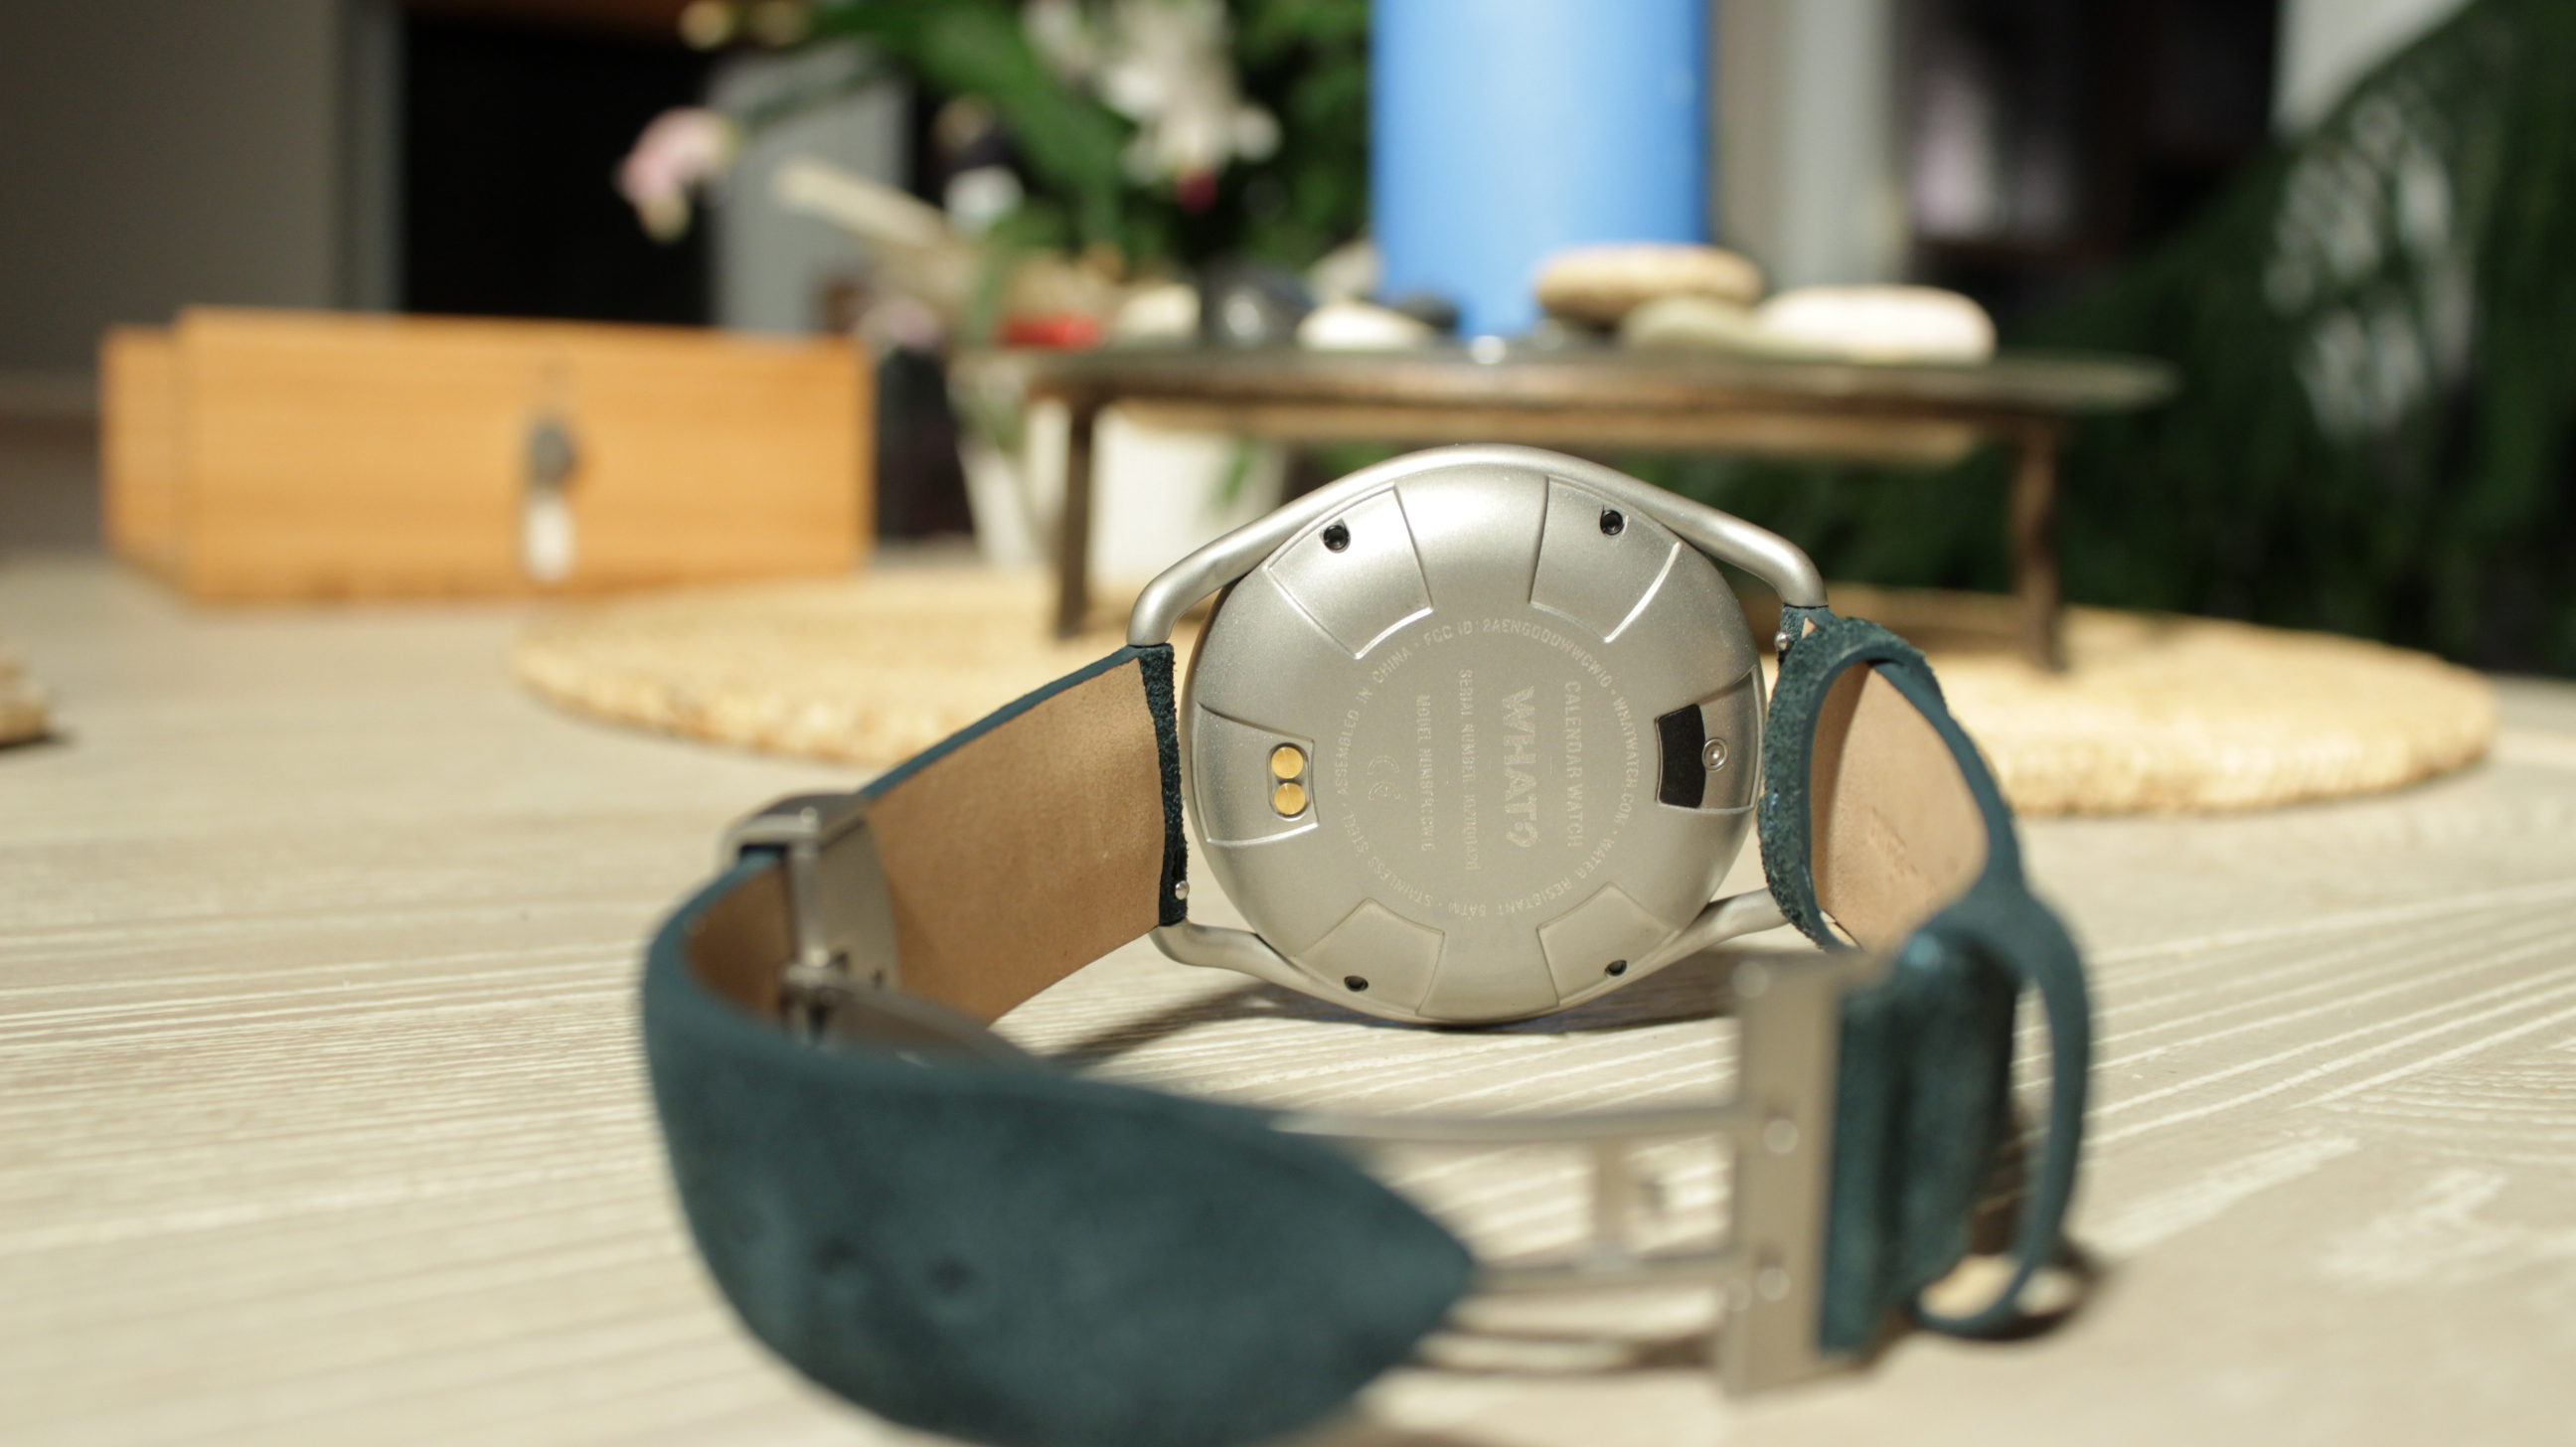 case & strap